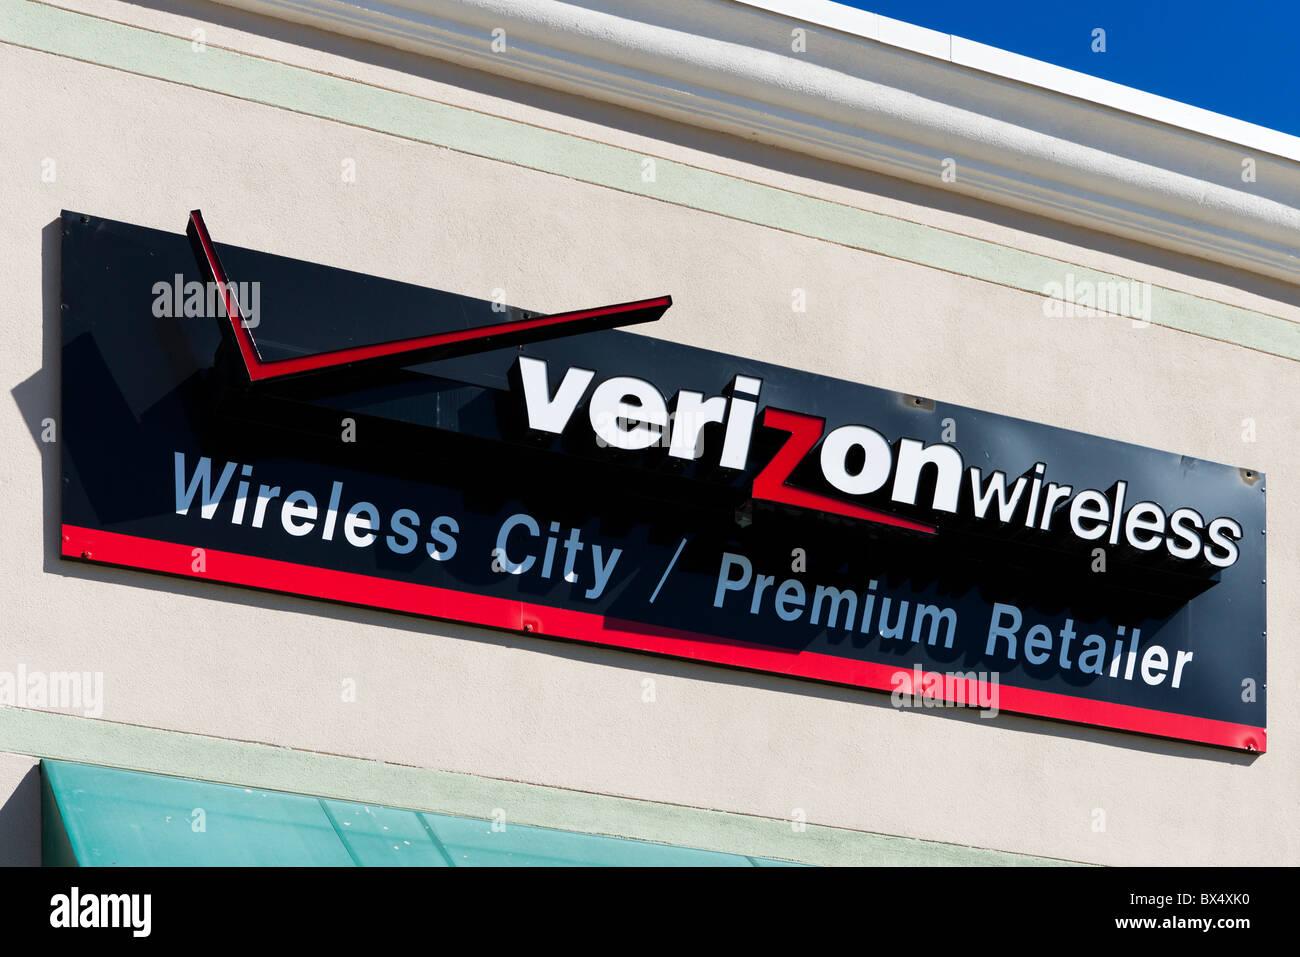 A Verizon Wireless retail store near the Eagle Ridge Mall, Lake Wales, Central Florida, USA - Stock Image